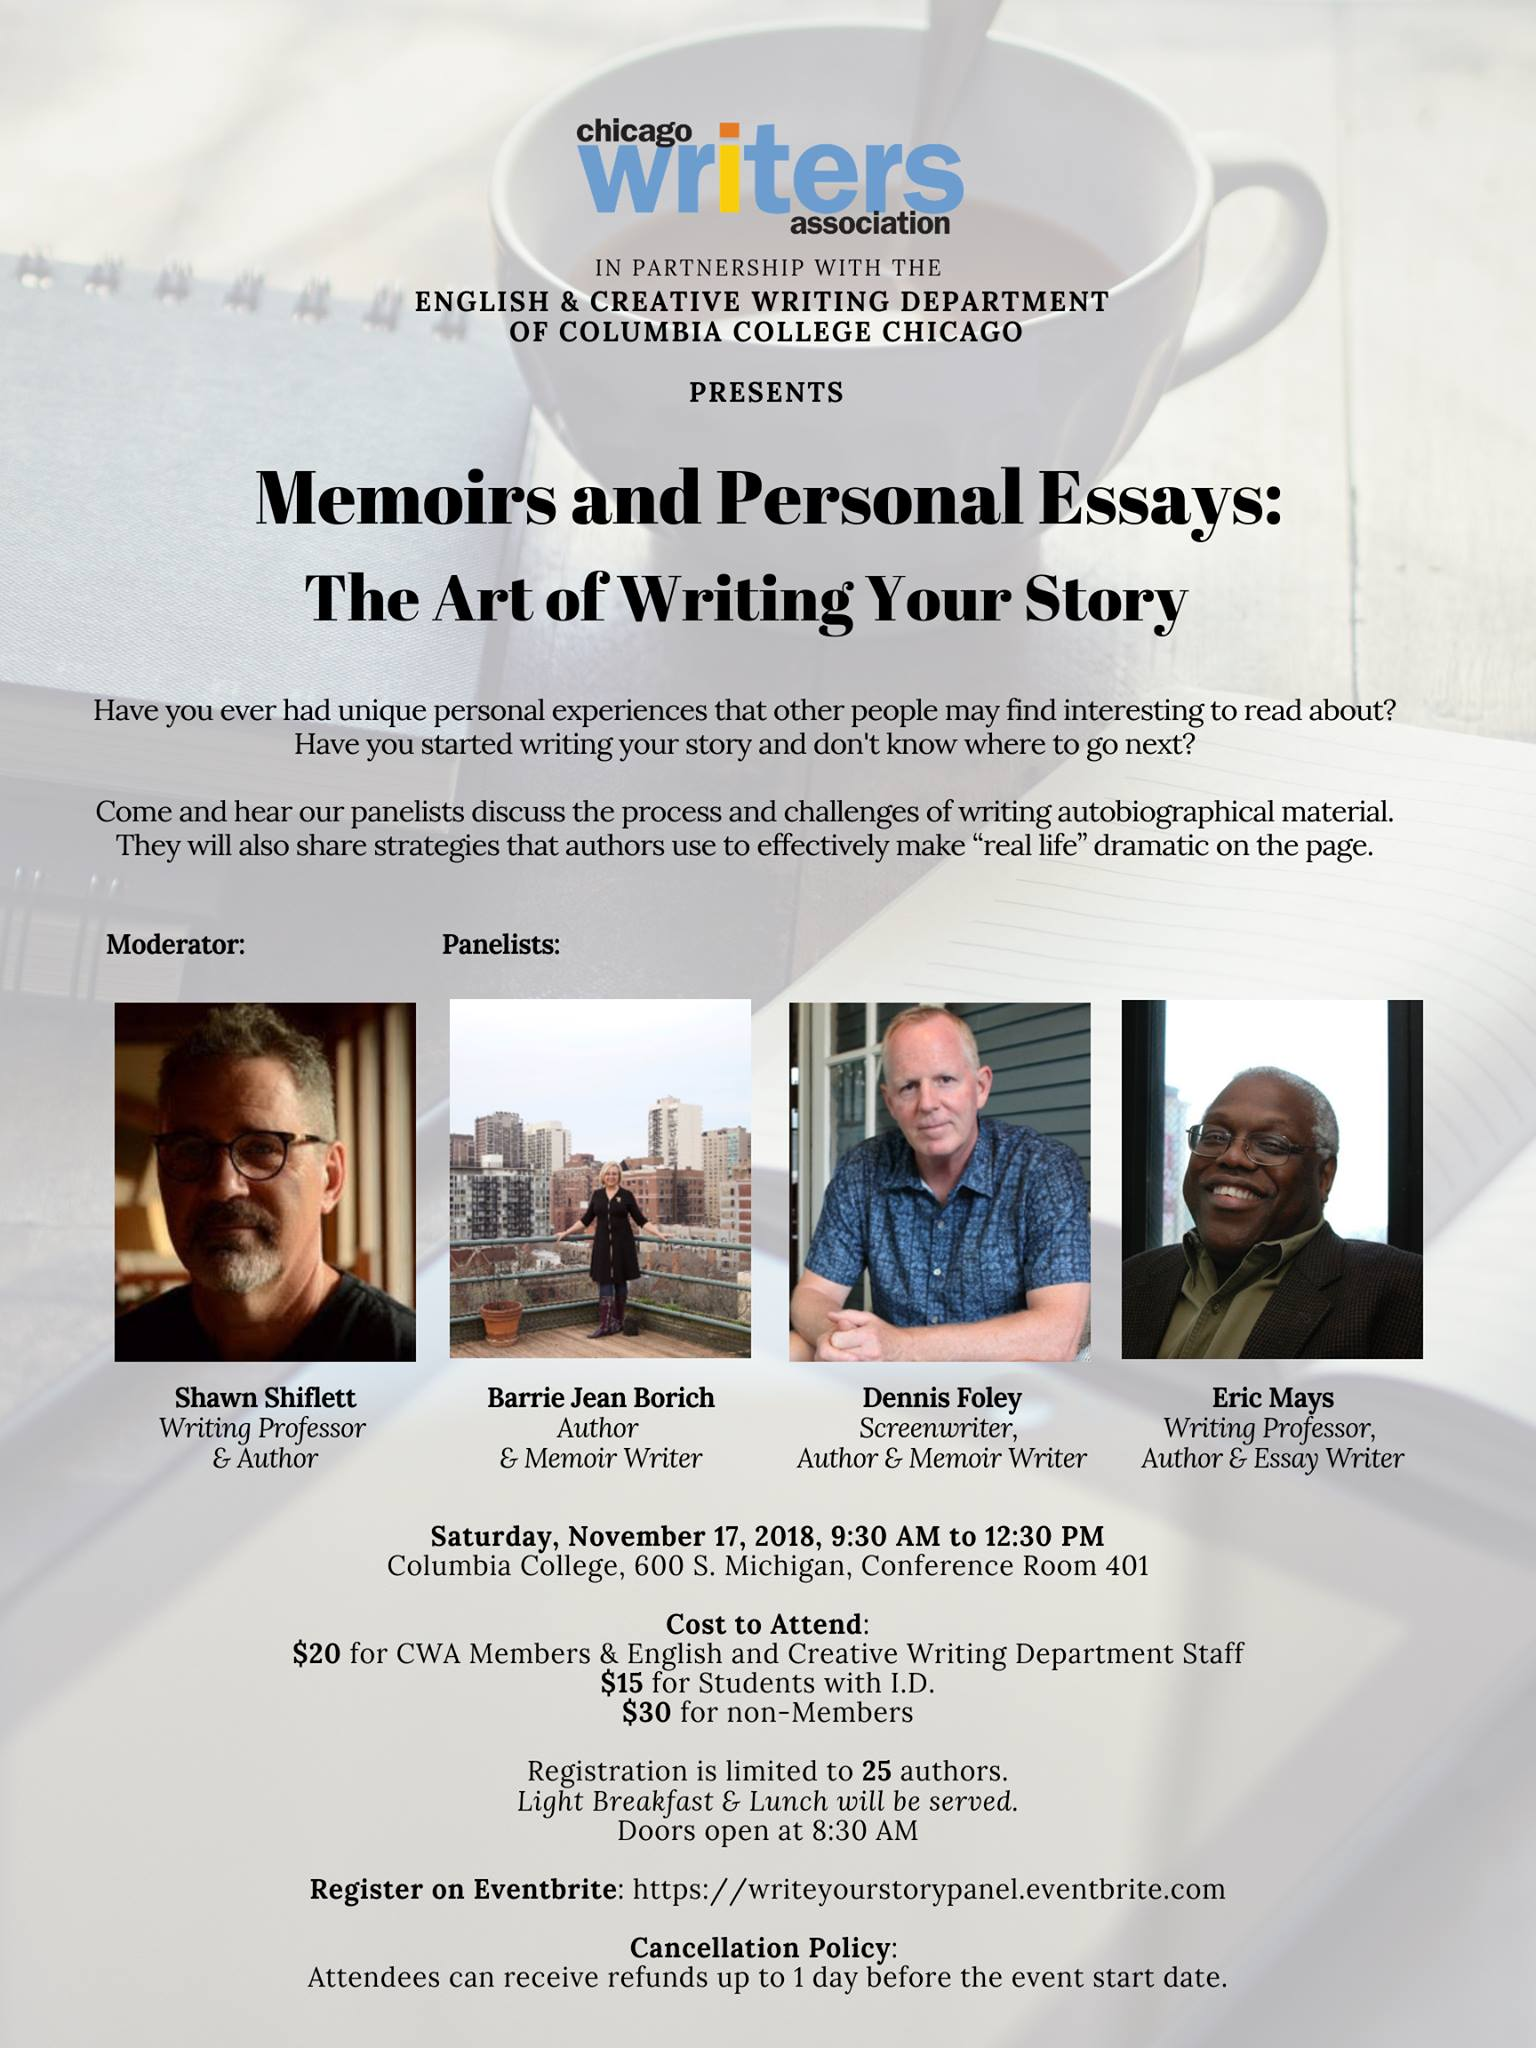 Chicago Writers' Association panel